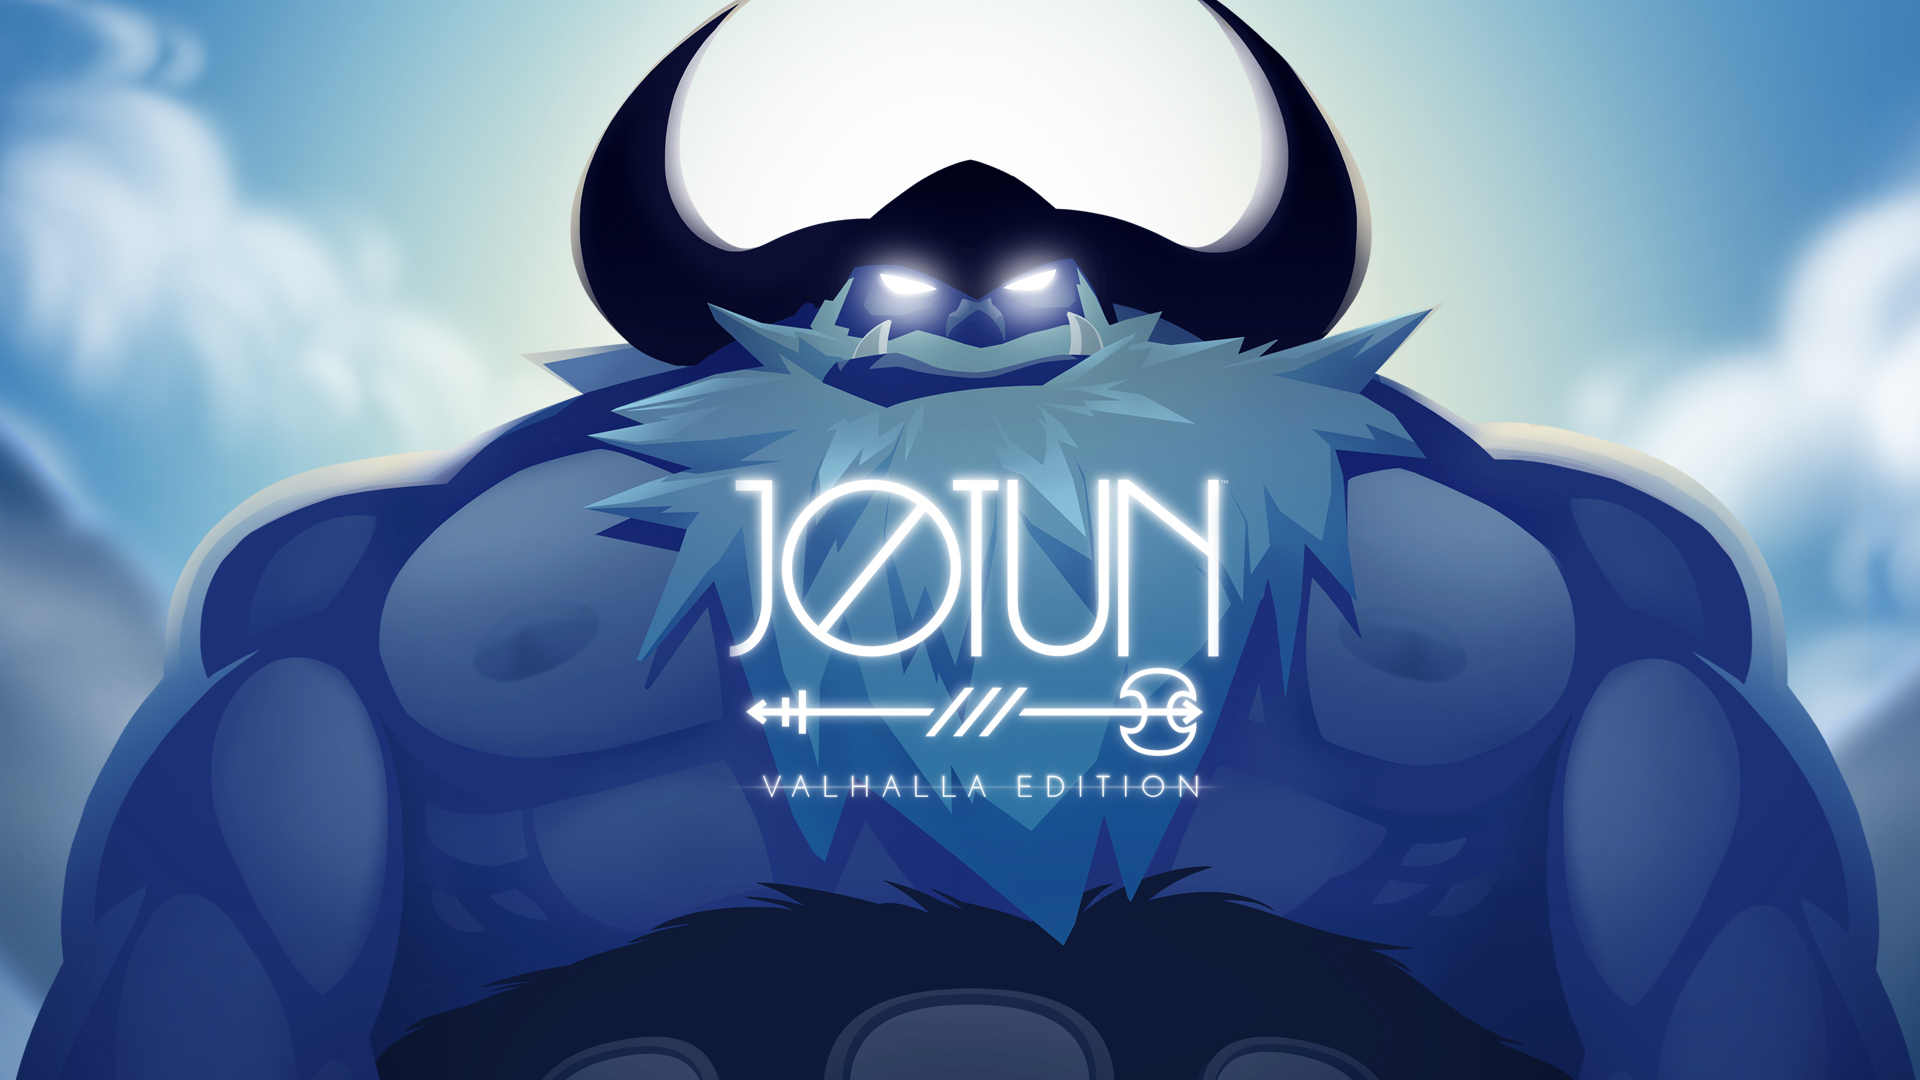 Resultado de imagem para Jotun: Valhalla Edition